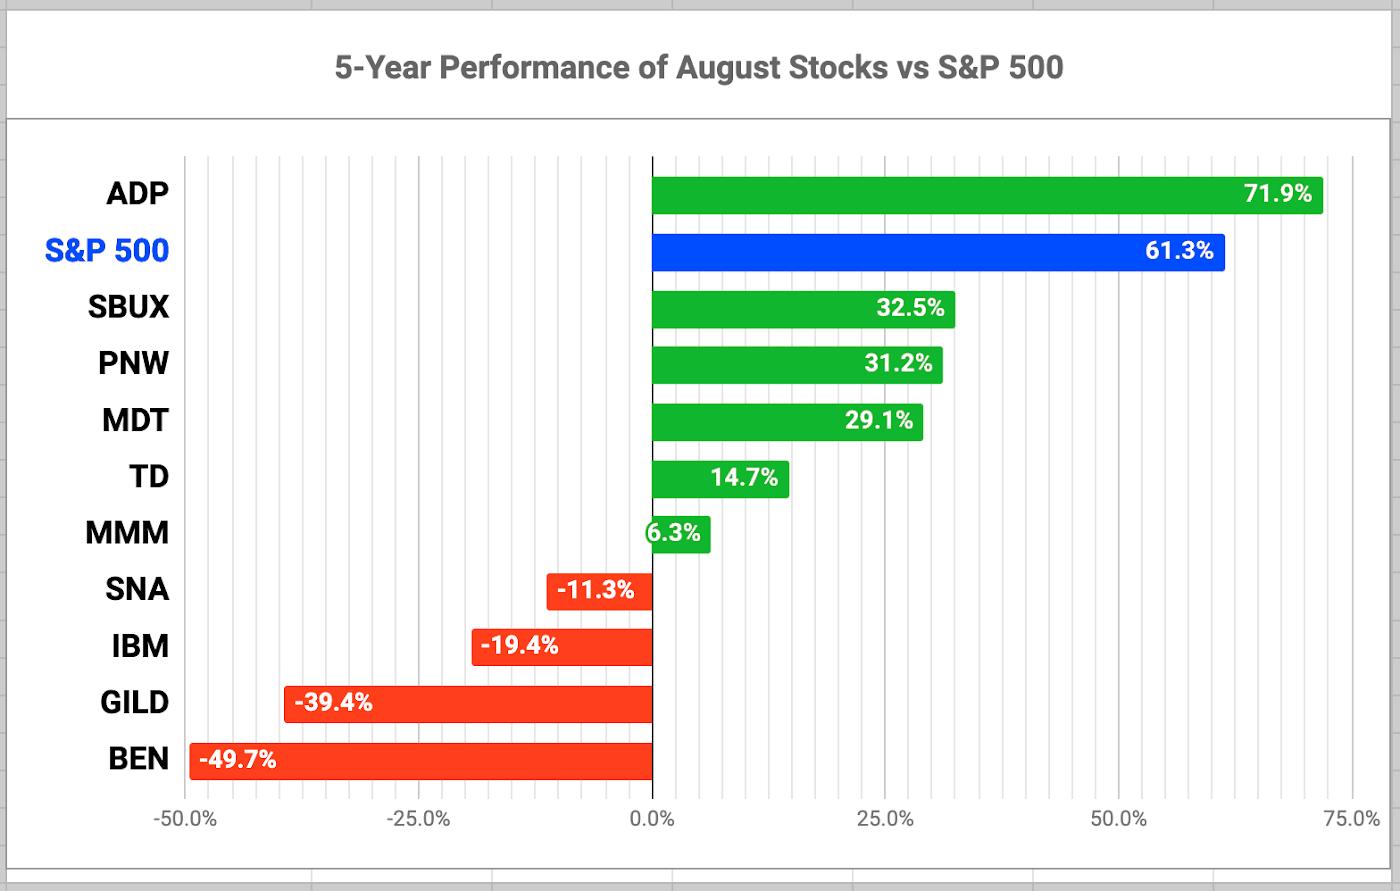 10 Dividend Growth Stocks For August 2020 | Seeking Alpha